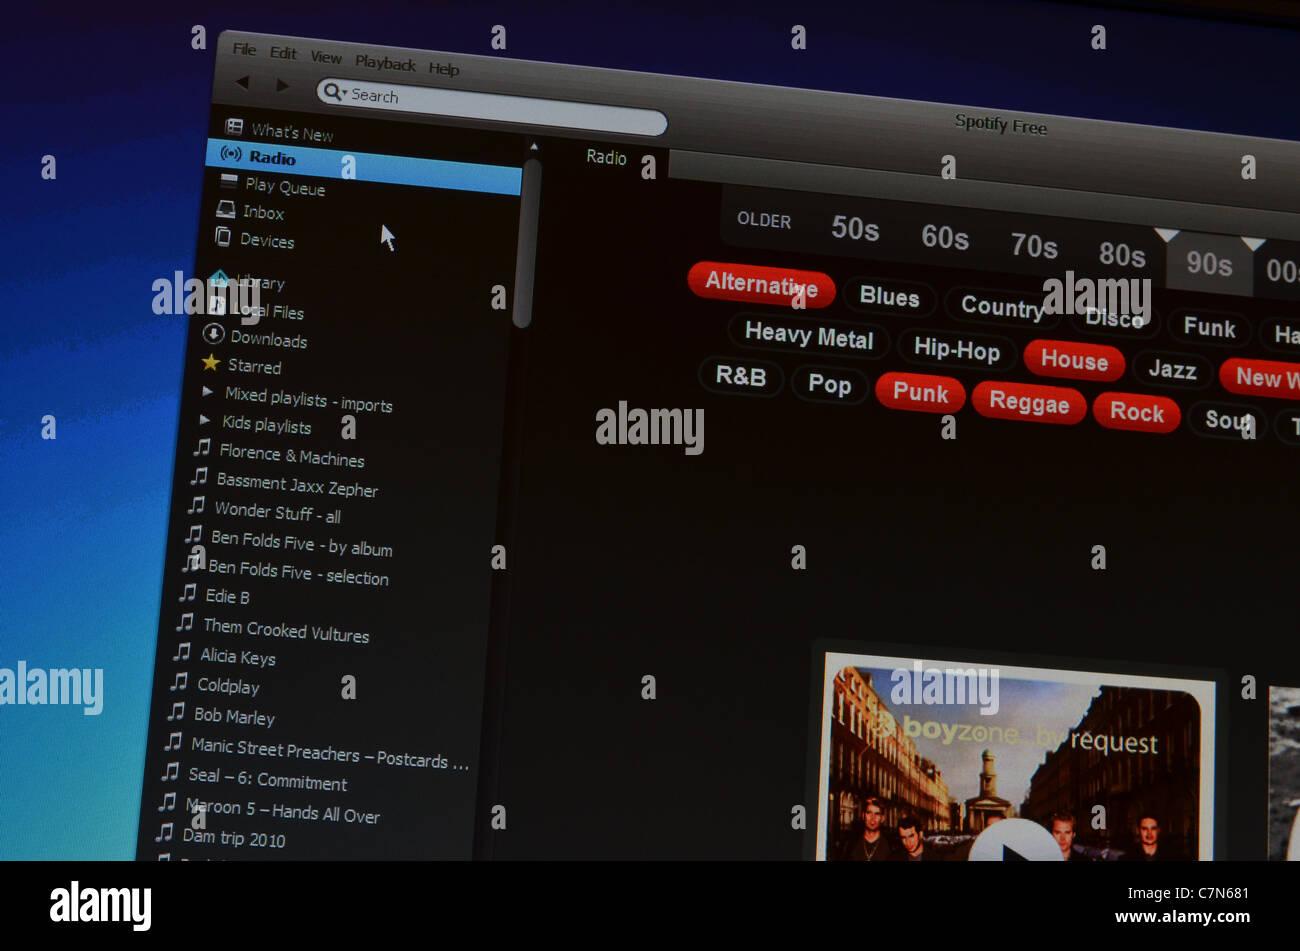 Spotify Free website screenshot page - Stock Image